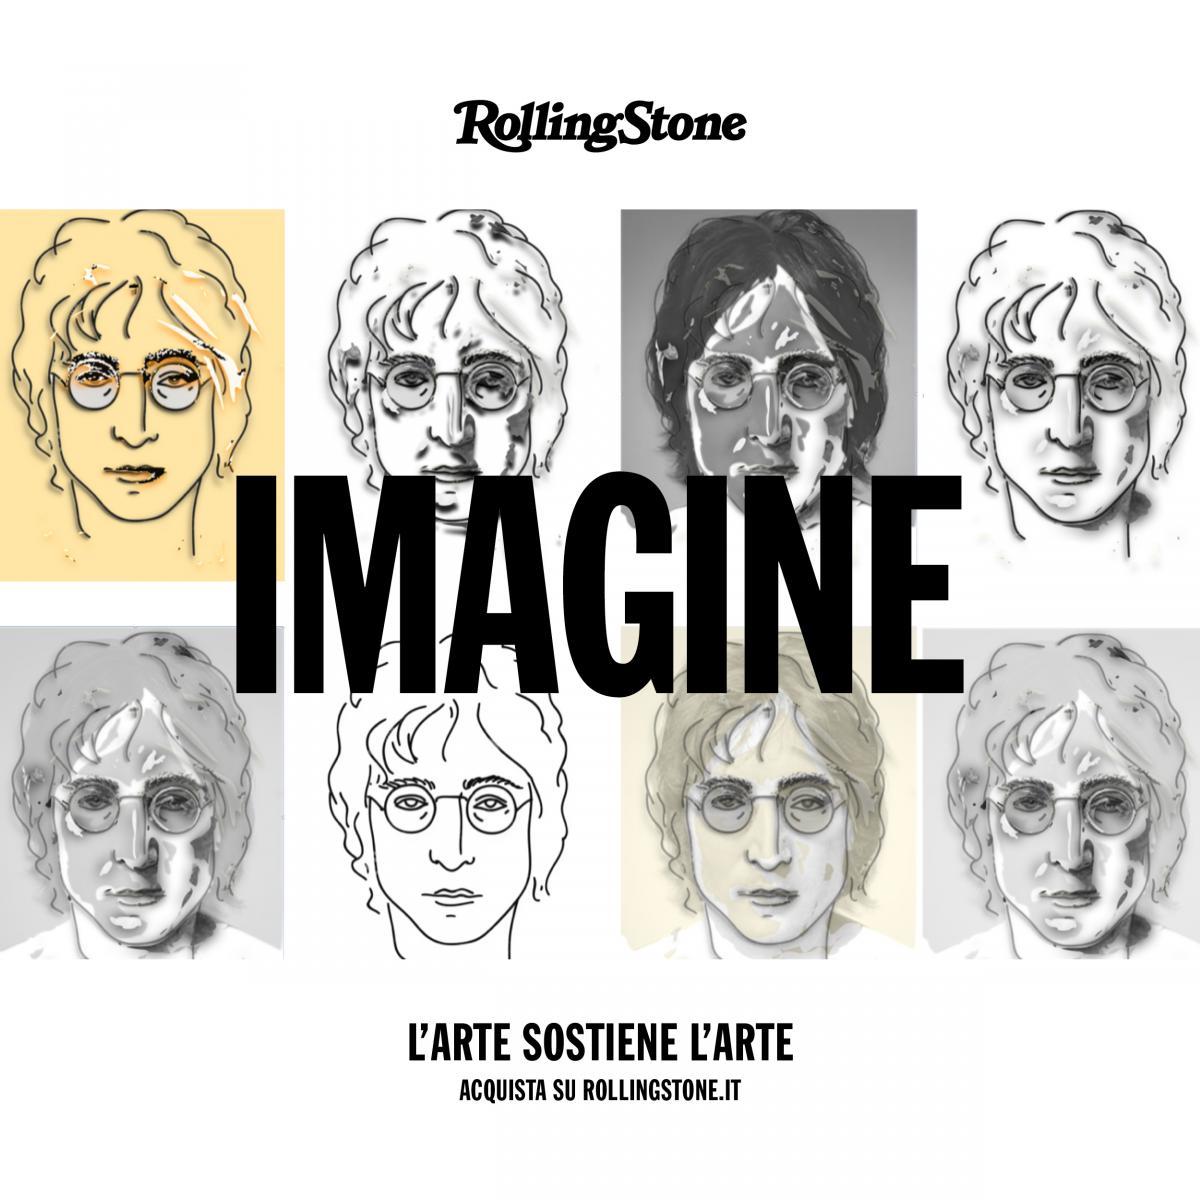 opera ispirata a John Lennon copertina iniziativa